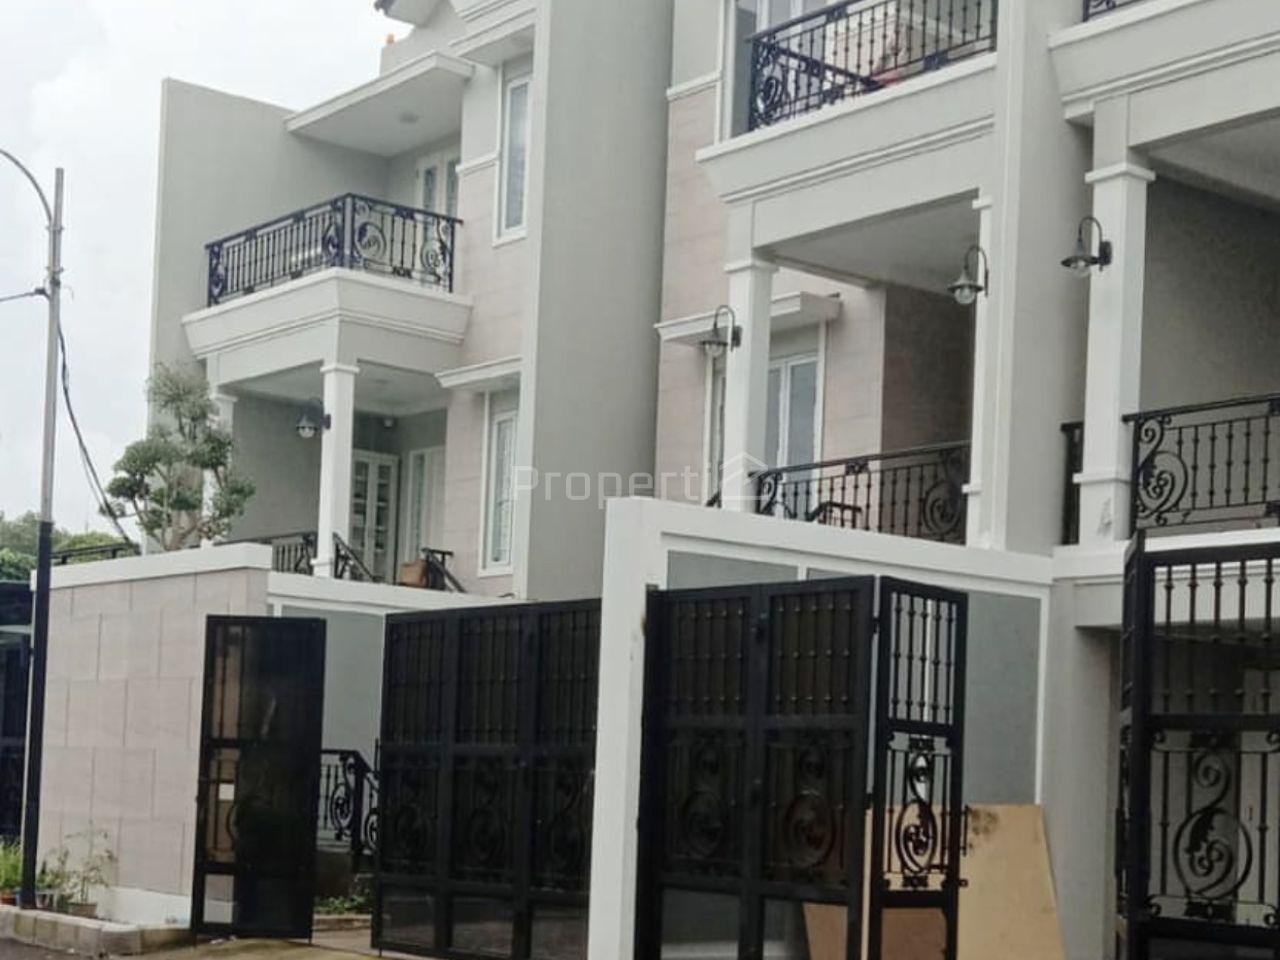 Rumah Modern di Mampang Prapatan, Jakarta Selatan, DKI Jakarta